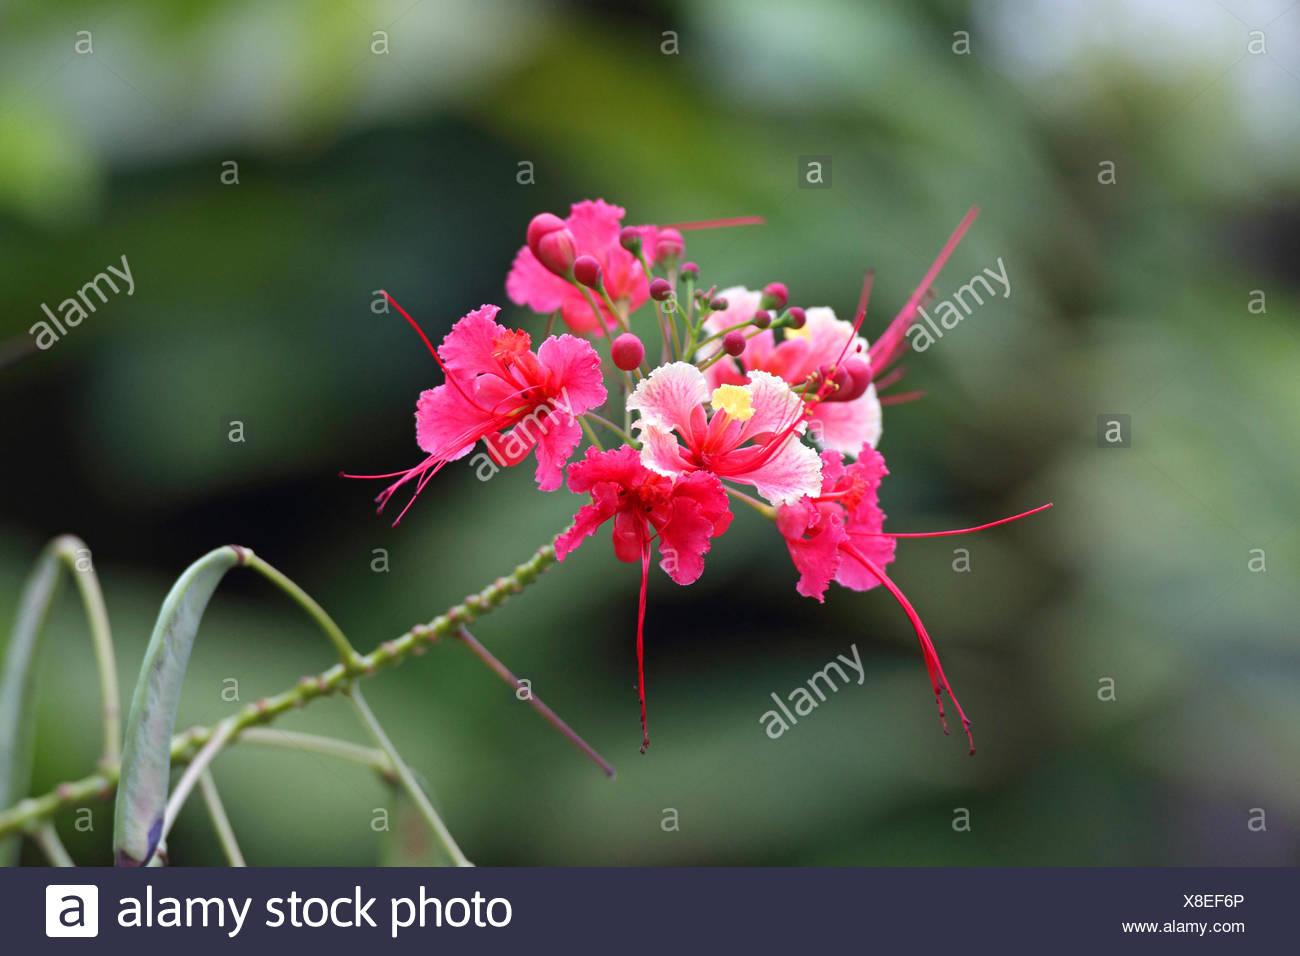 peacock flower, Barbados pride, dwarf poinciana, Barbados flower-fence, red bird-of-paradise, red bird of paradise (Caesalpinia pulcherrima 'Rosea', Caesalpinia pulcherrima Rosea), inflorescence, Seychelles, Mahe - Stock Image